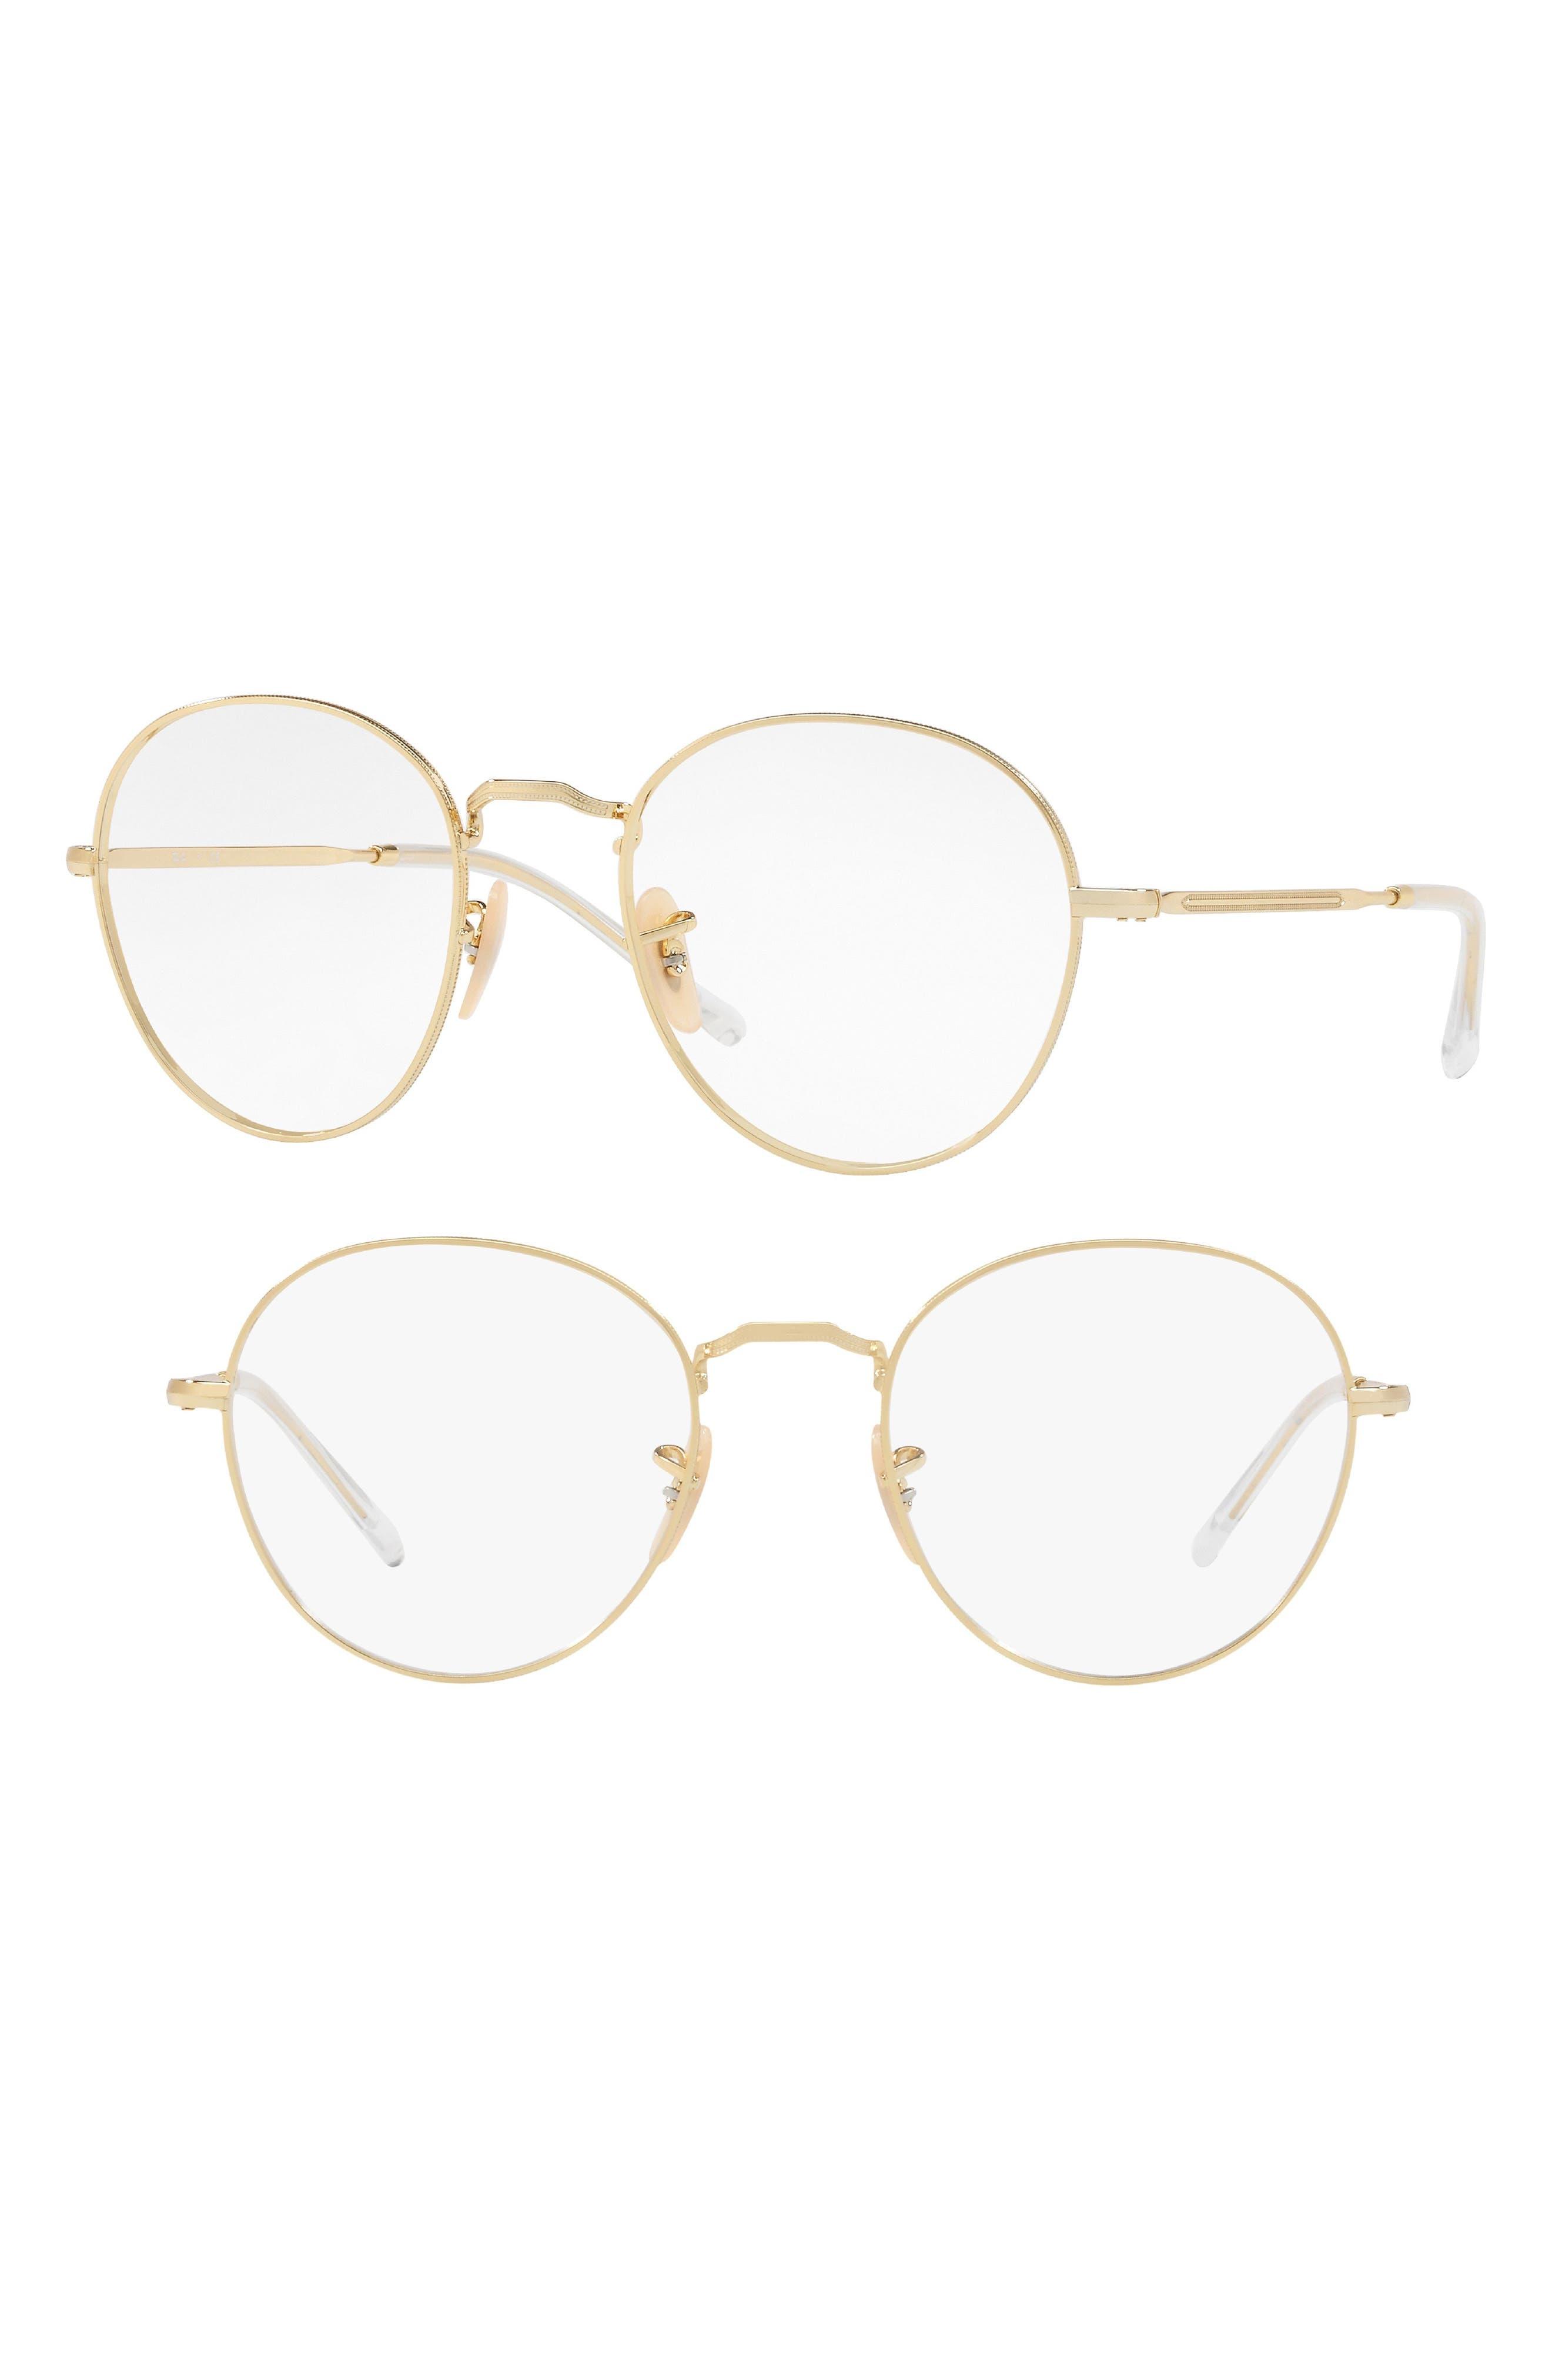 1940s Sunglasses, Glasses & Eyeglasses History Womens Ray-Ban 49mm Round Optical Glasses - Gold $168.00 AT vintagedancer.com